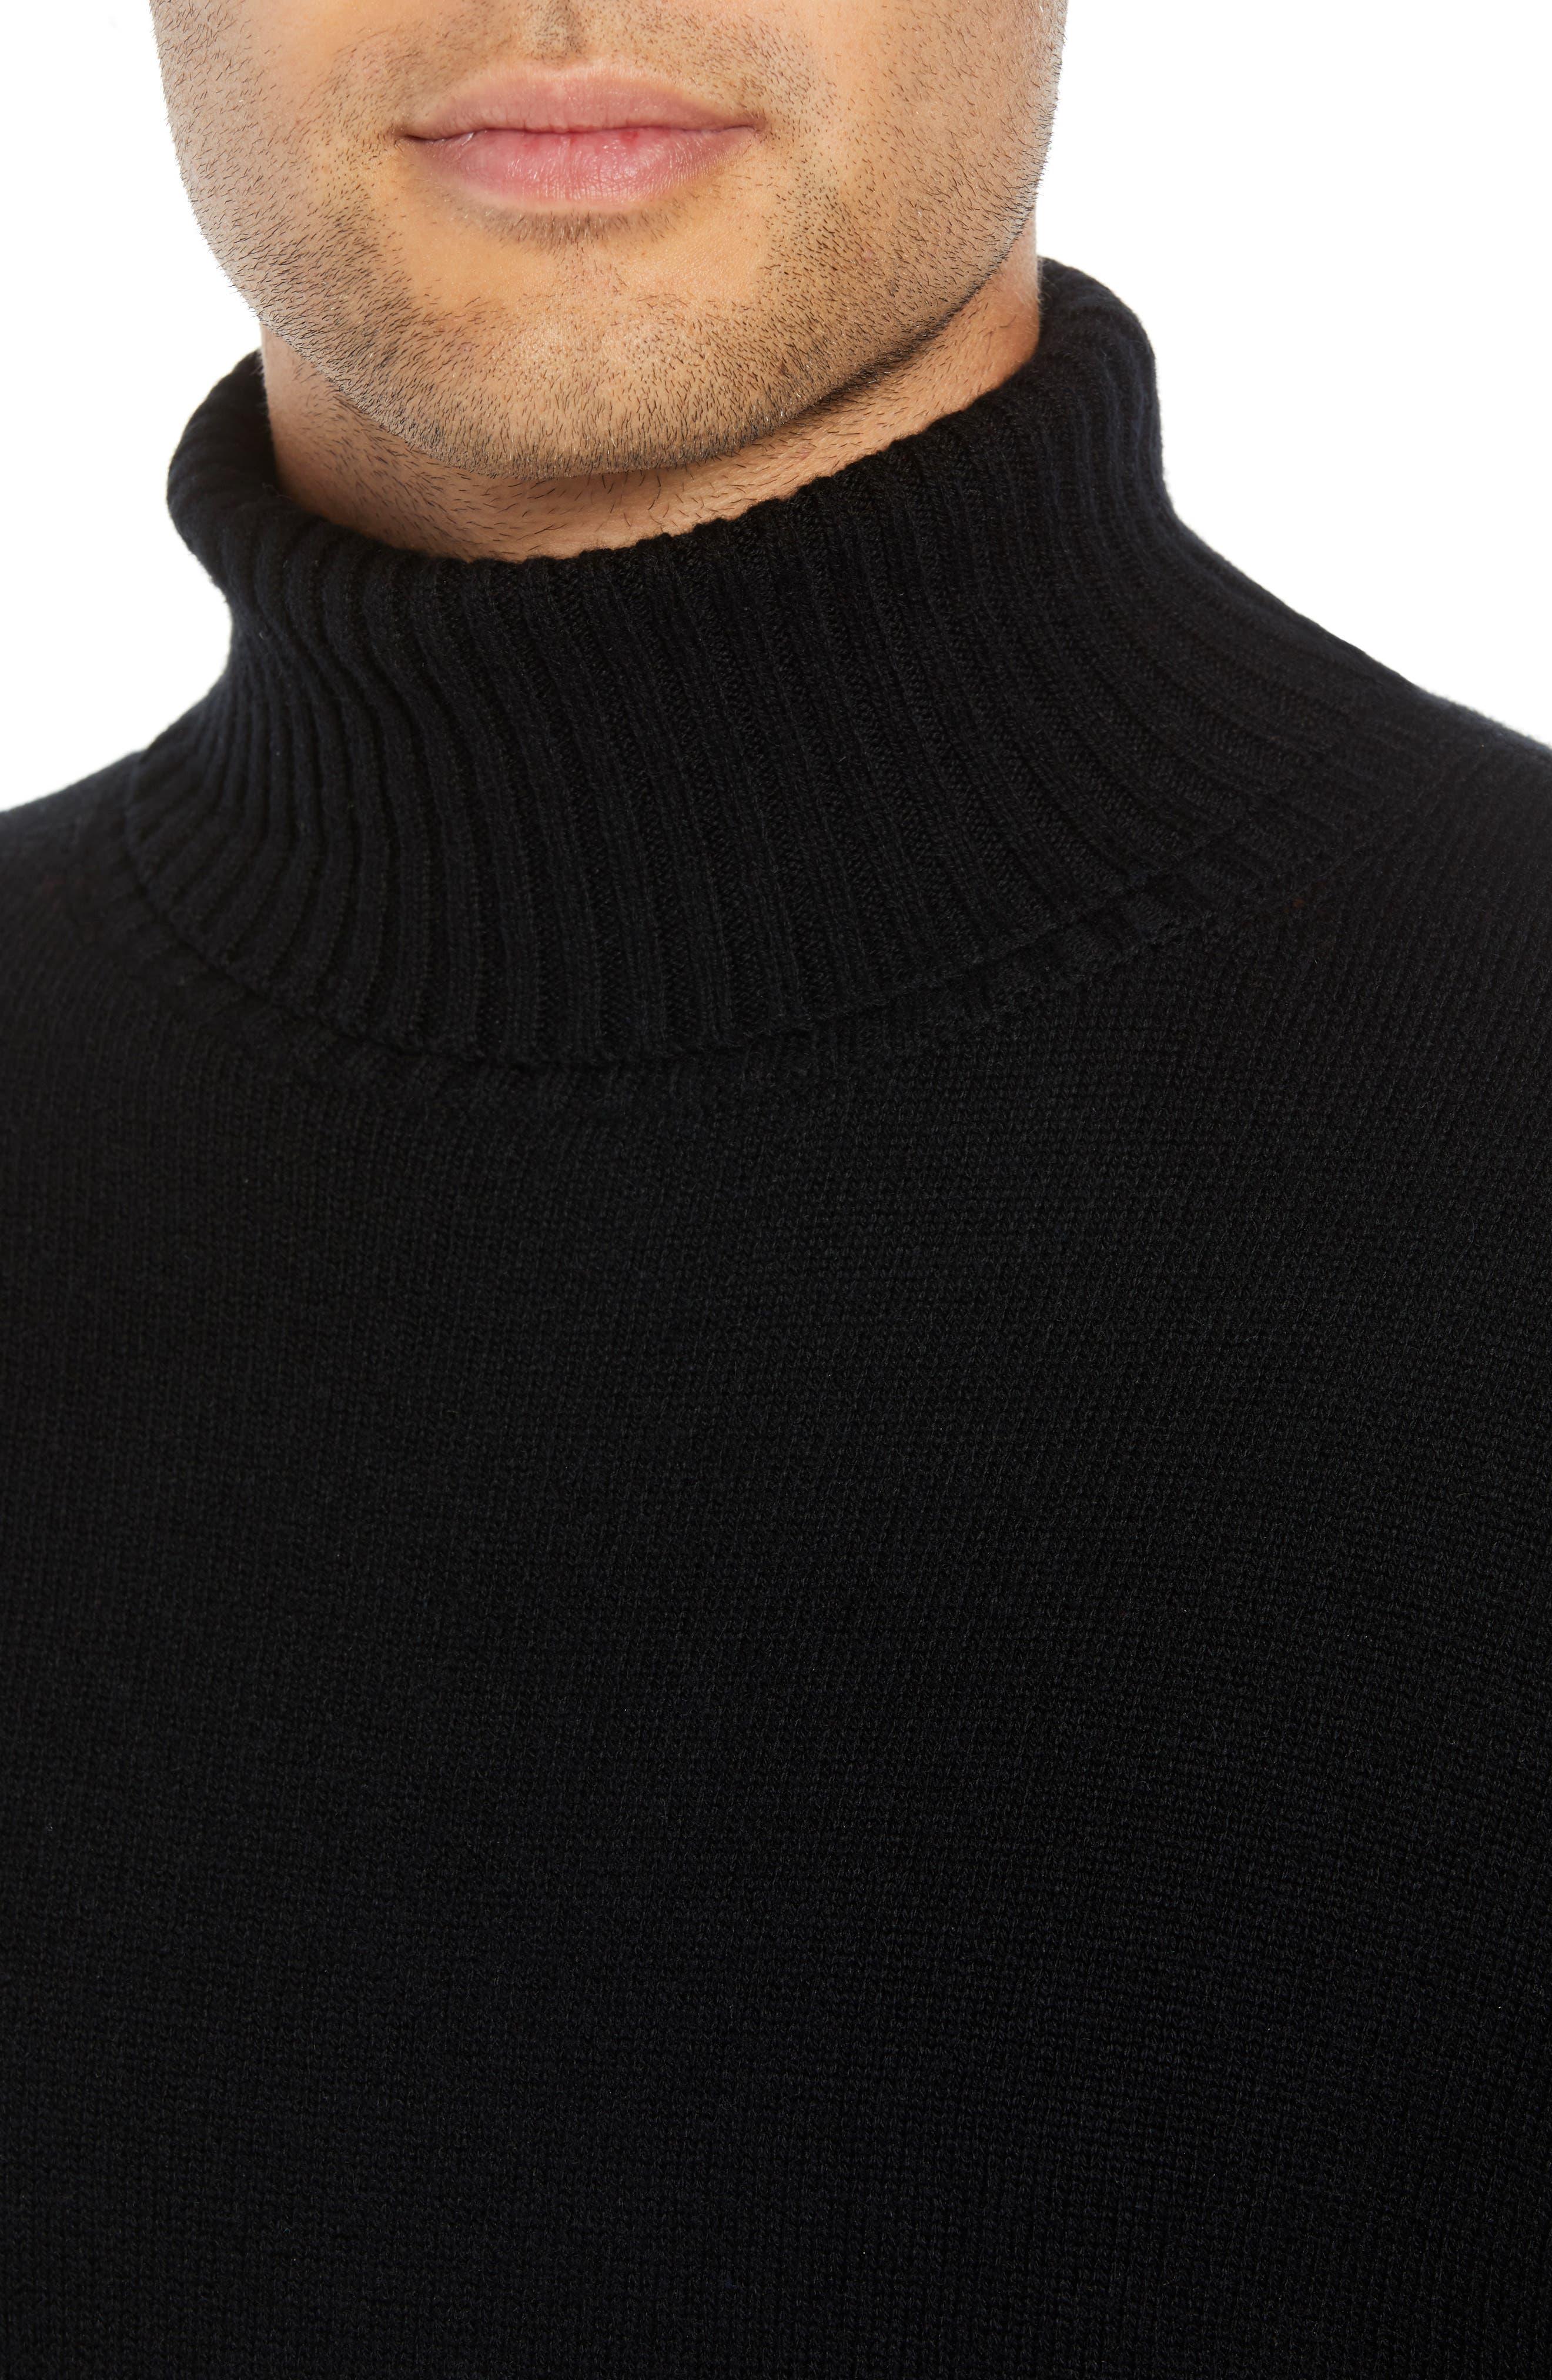 Wool & Cashmere Turtleneck Sweater,                             Alternate thumbnail 4, color,                             BLACK